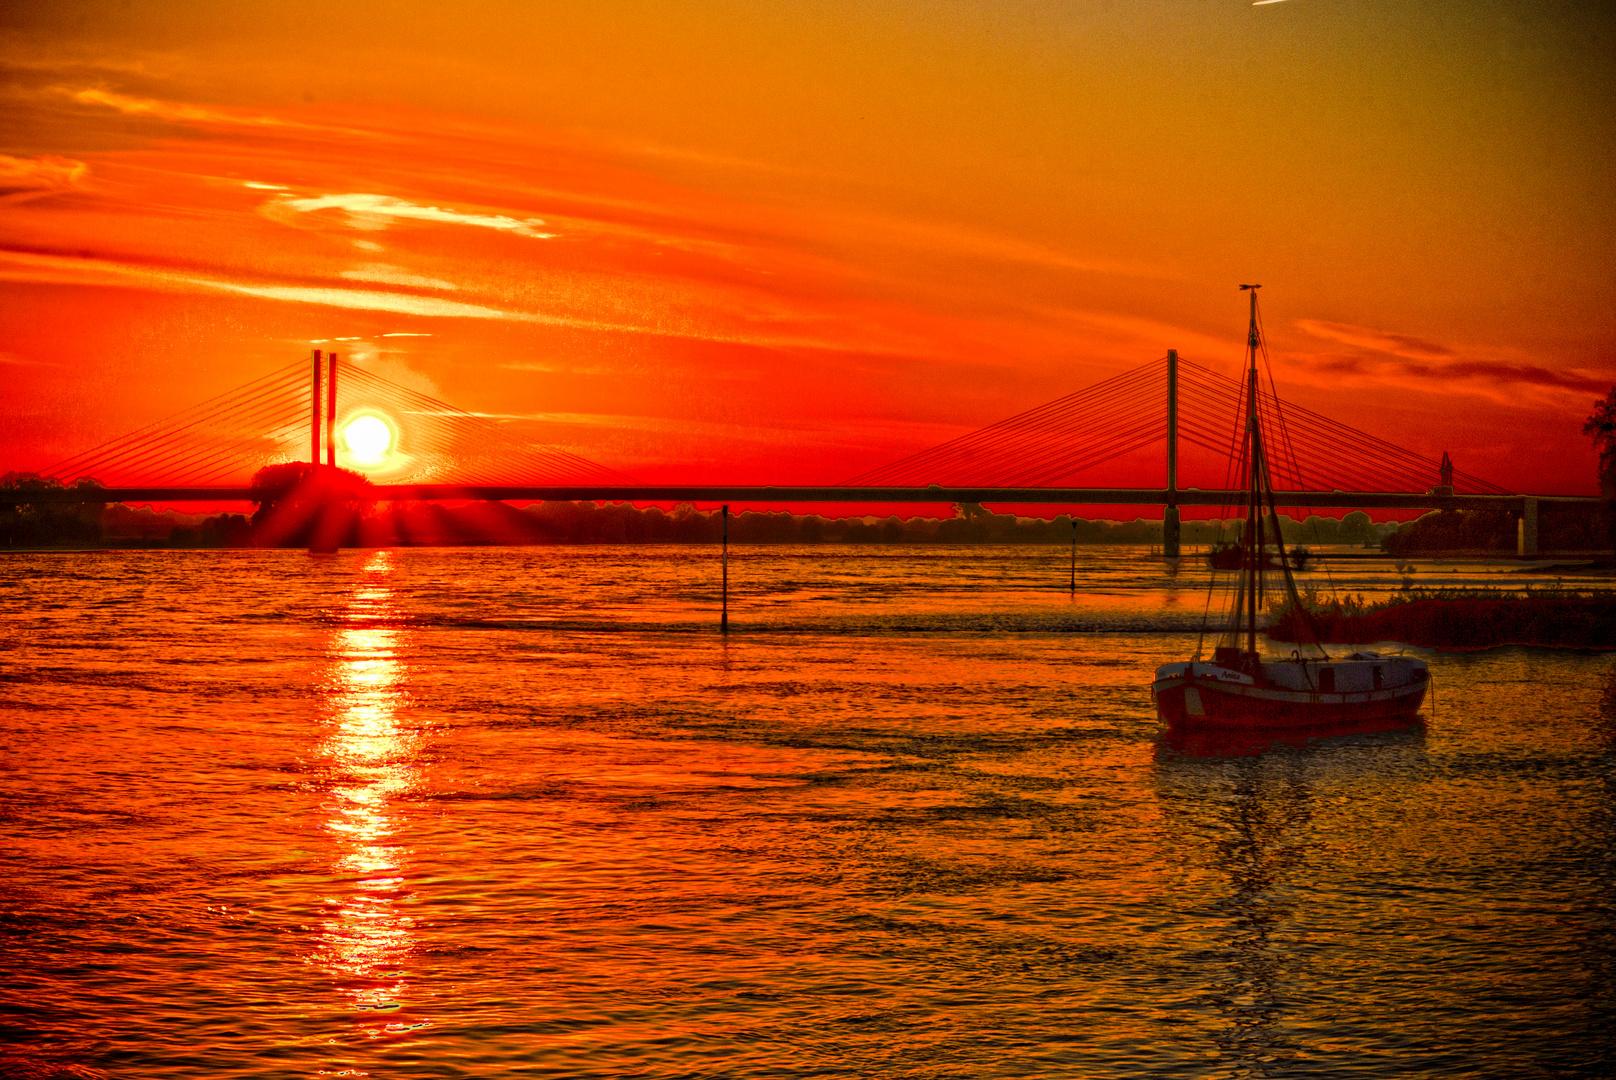 Sonnenuntergang in Rees am Rhein